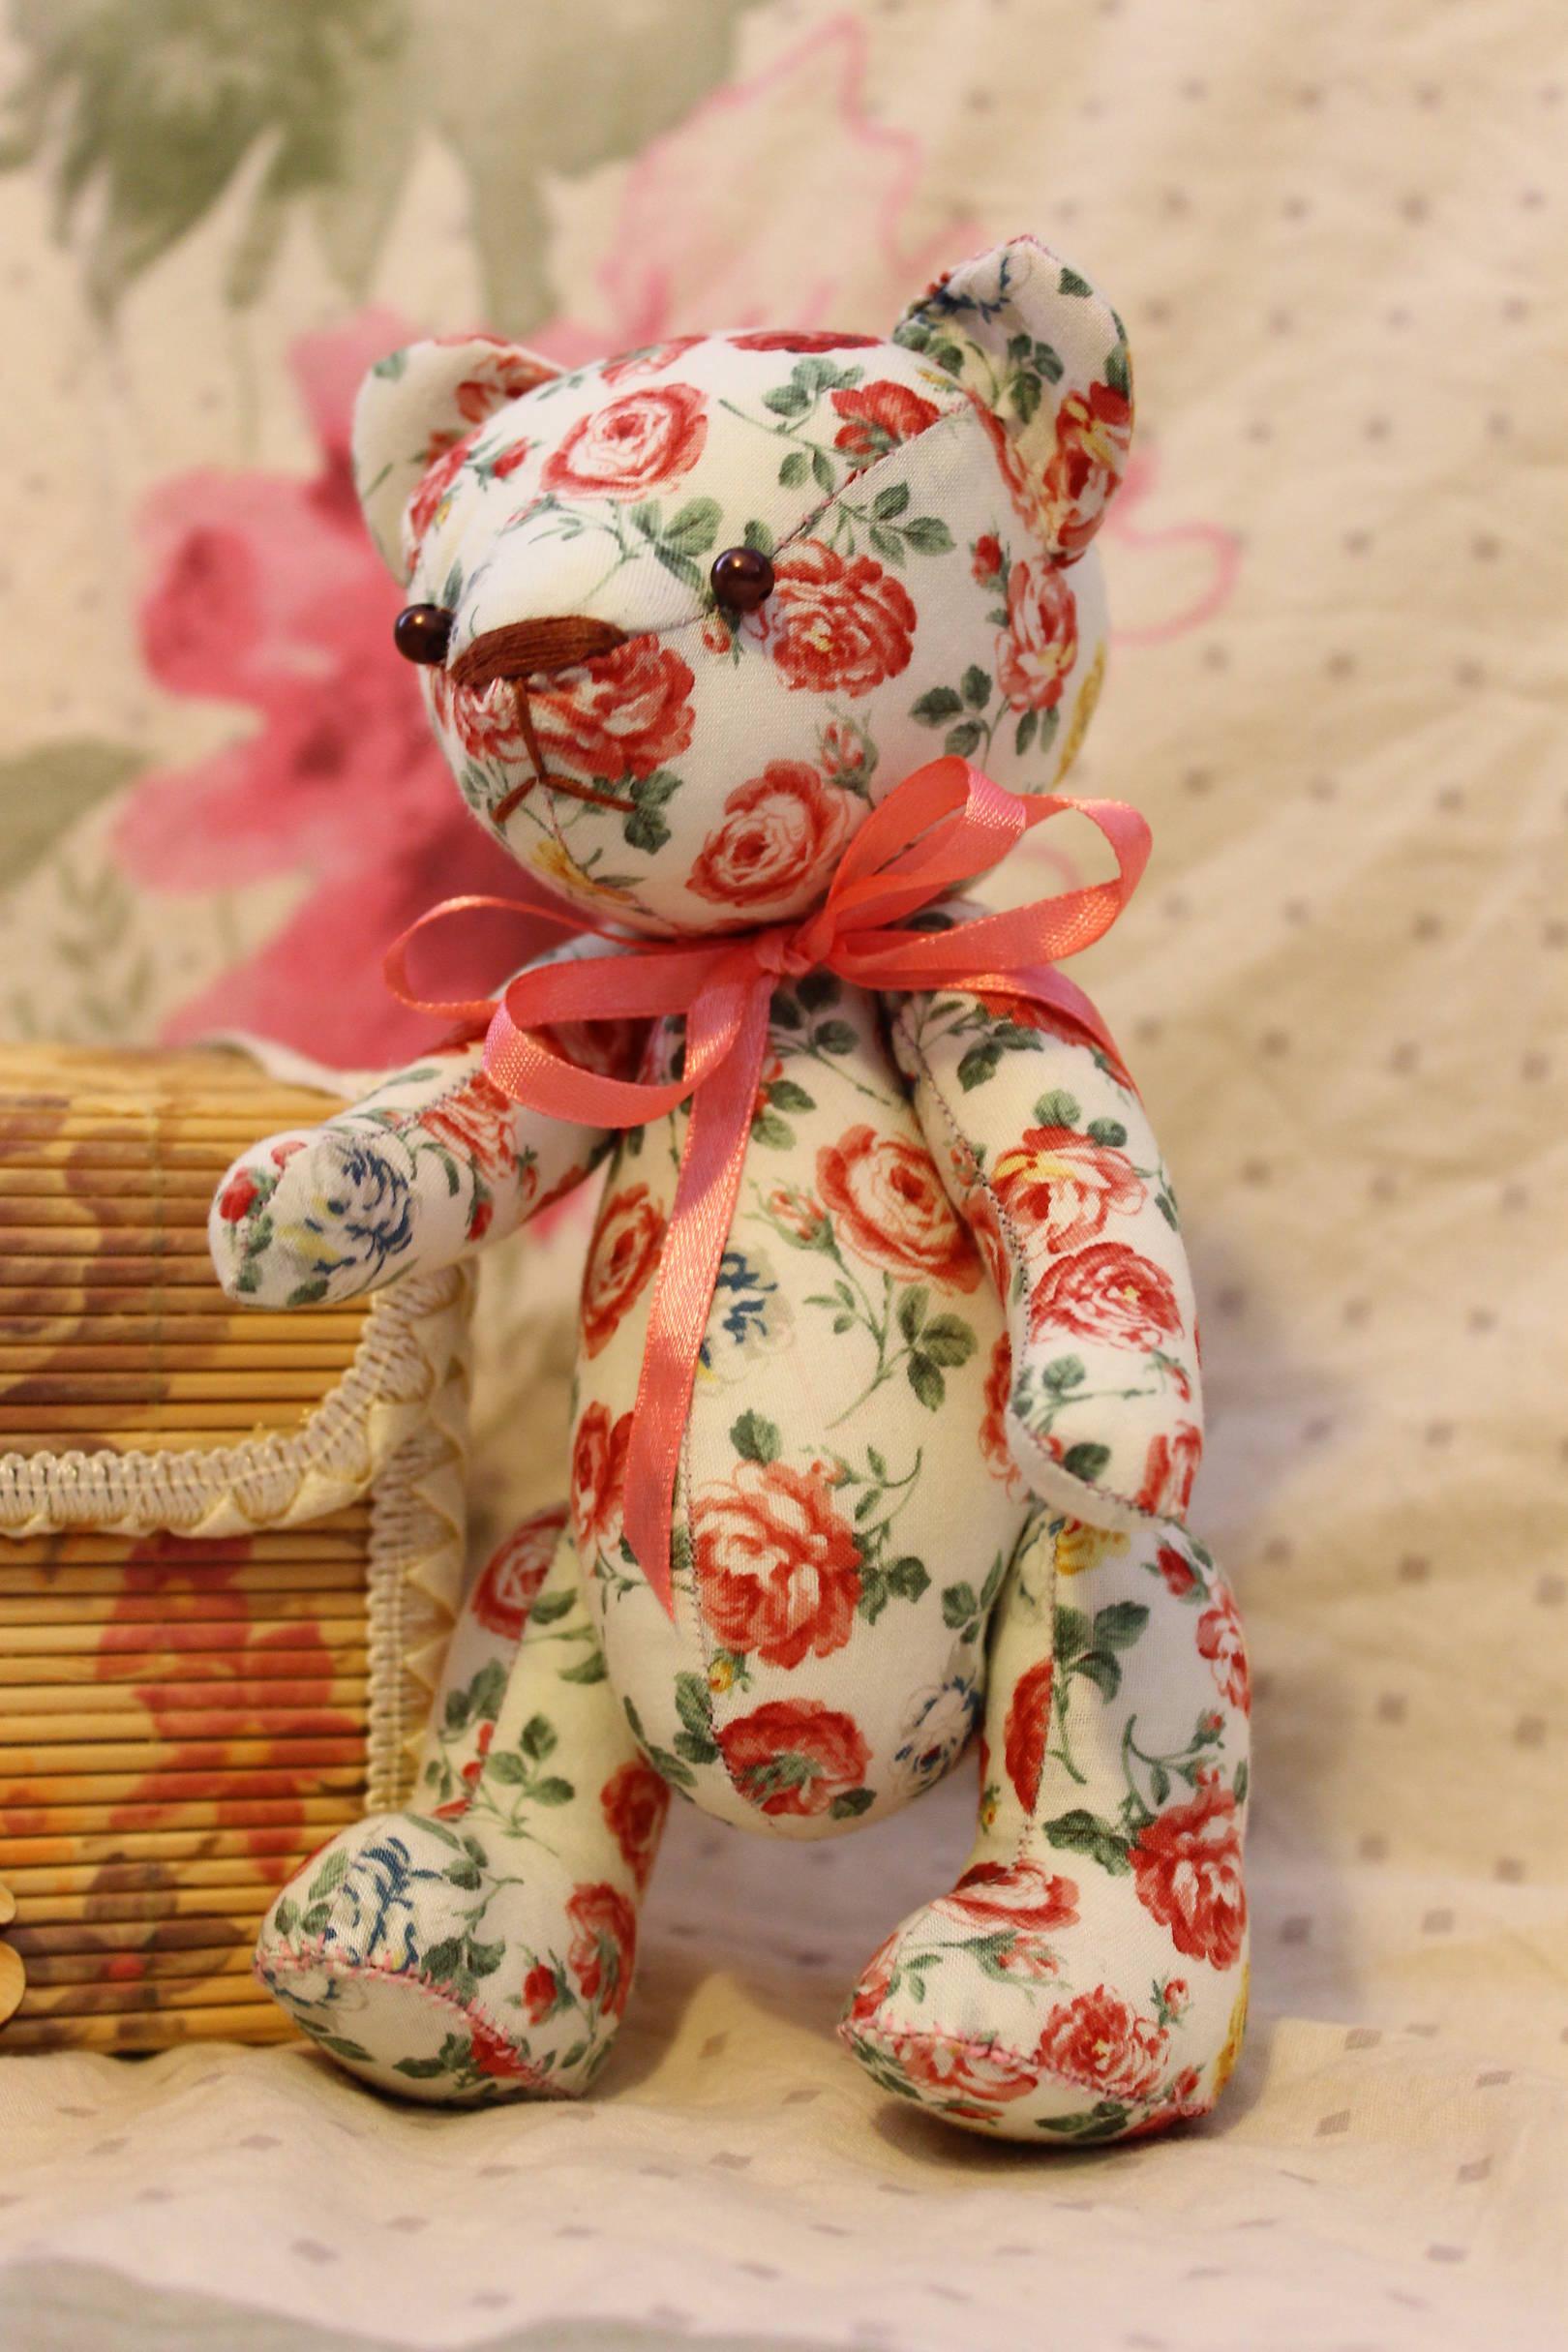 Винтажный мишка Тедди!